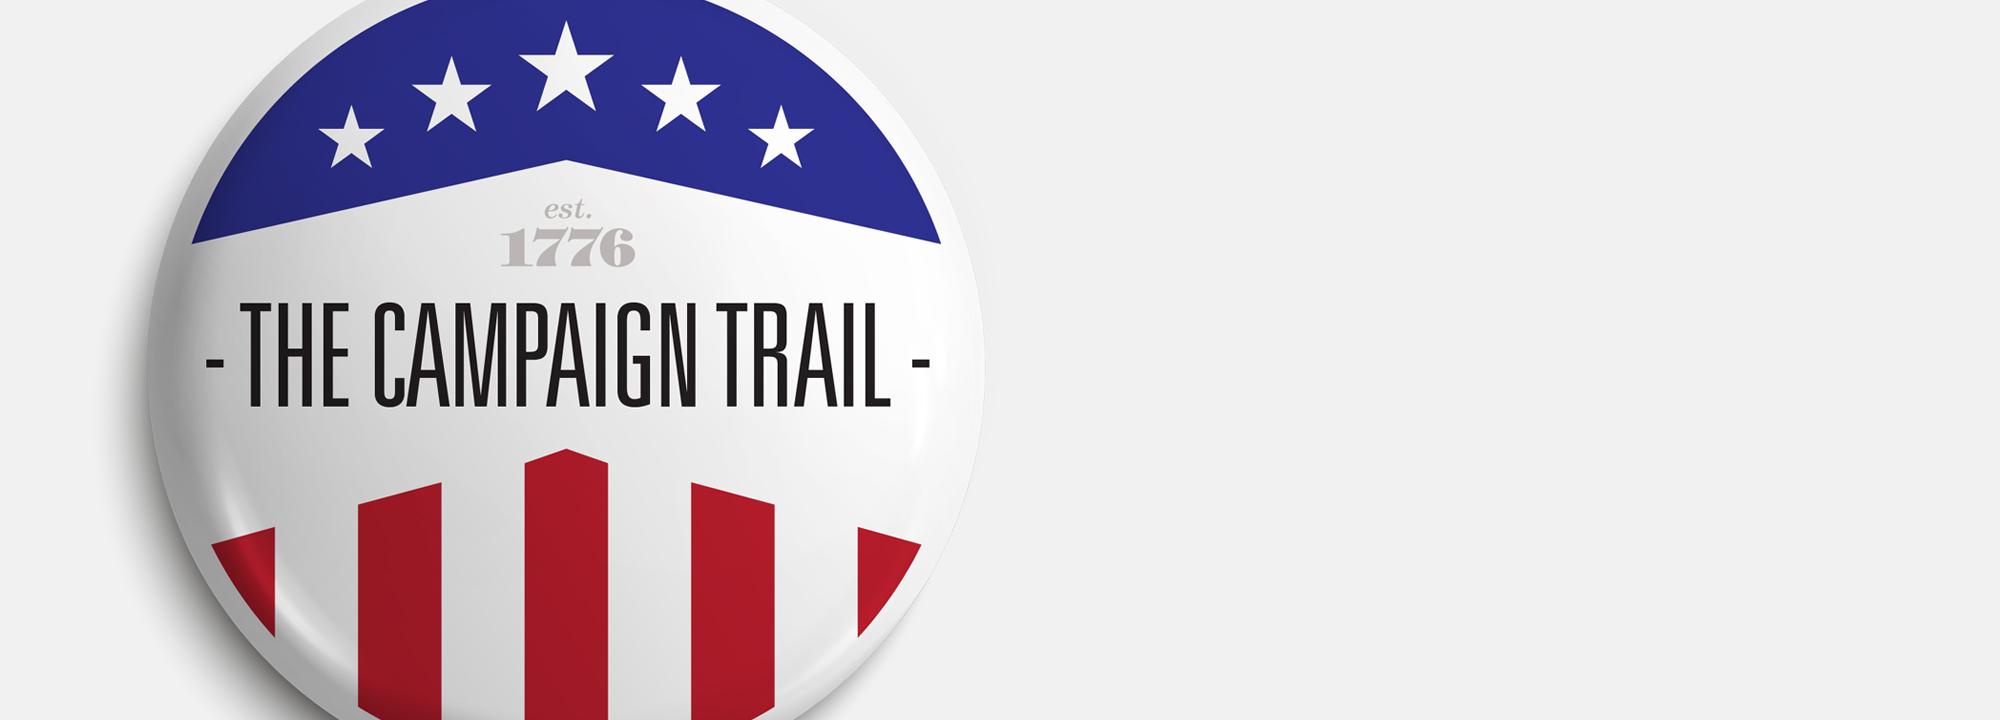 The Campaign Trail